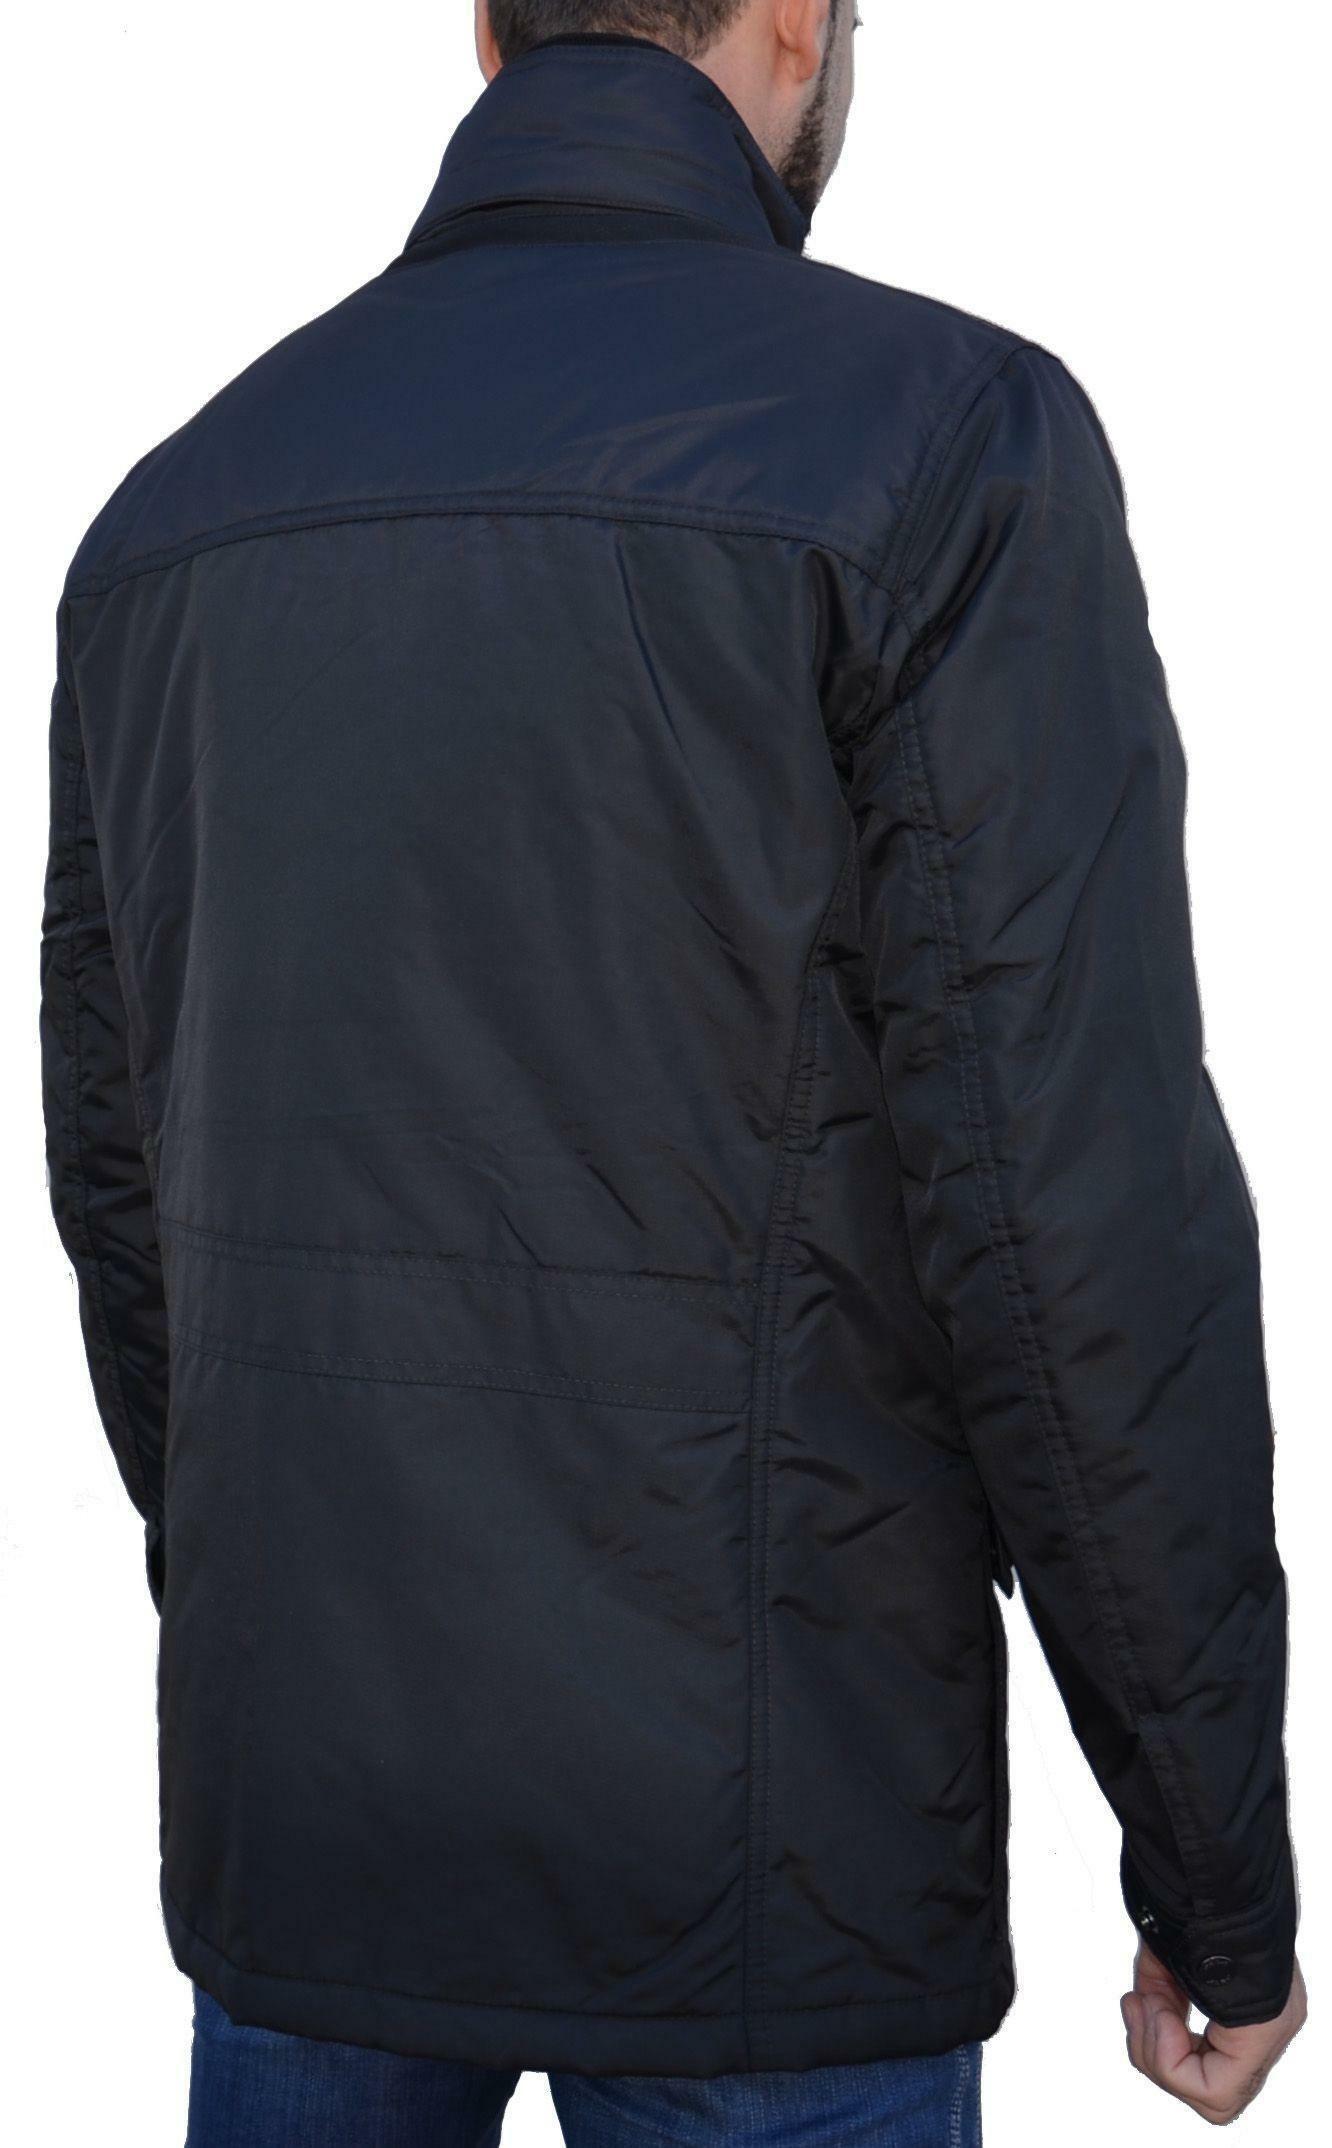 geox man jacket giubbotto uomo nero